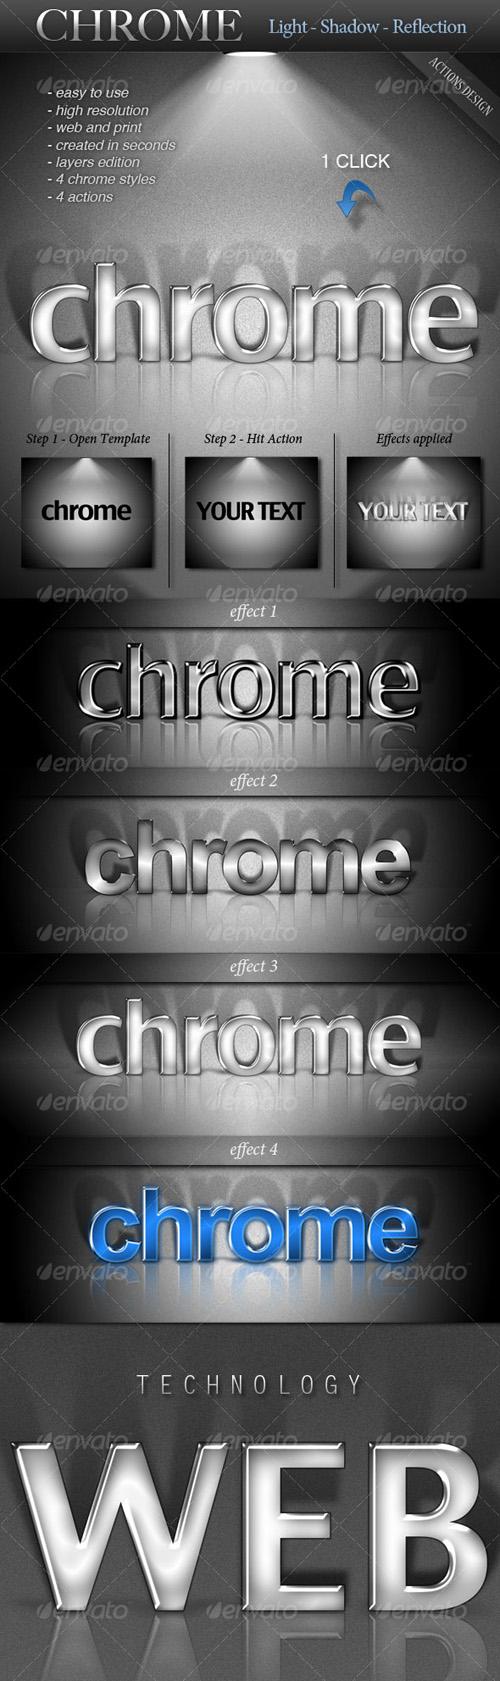 GraphicRiver - CHROME - Light, Shadow, Reflection